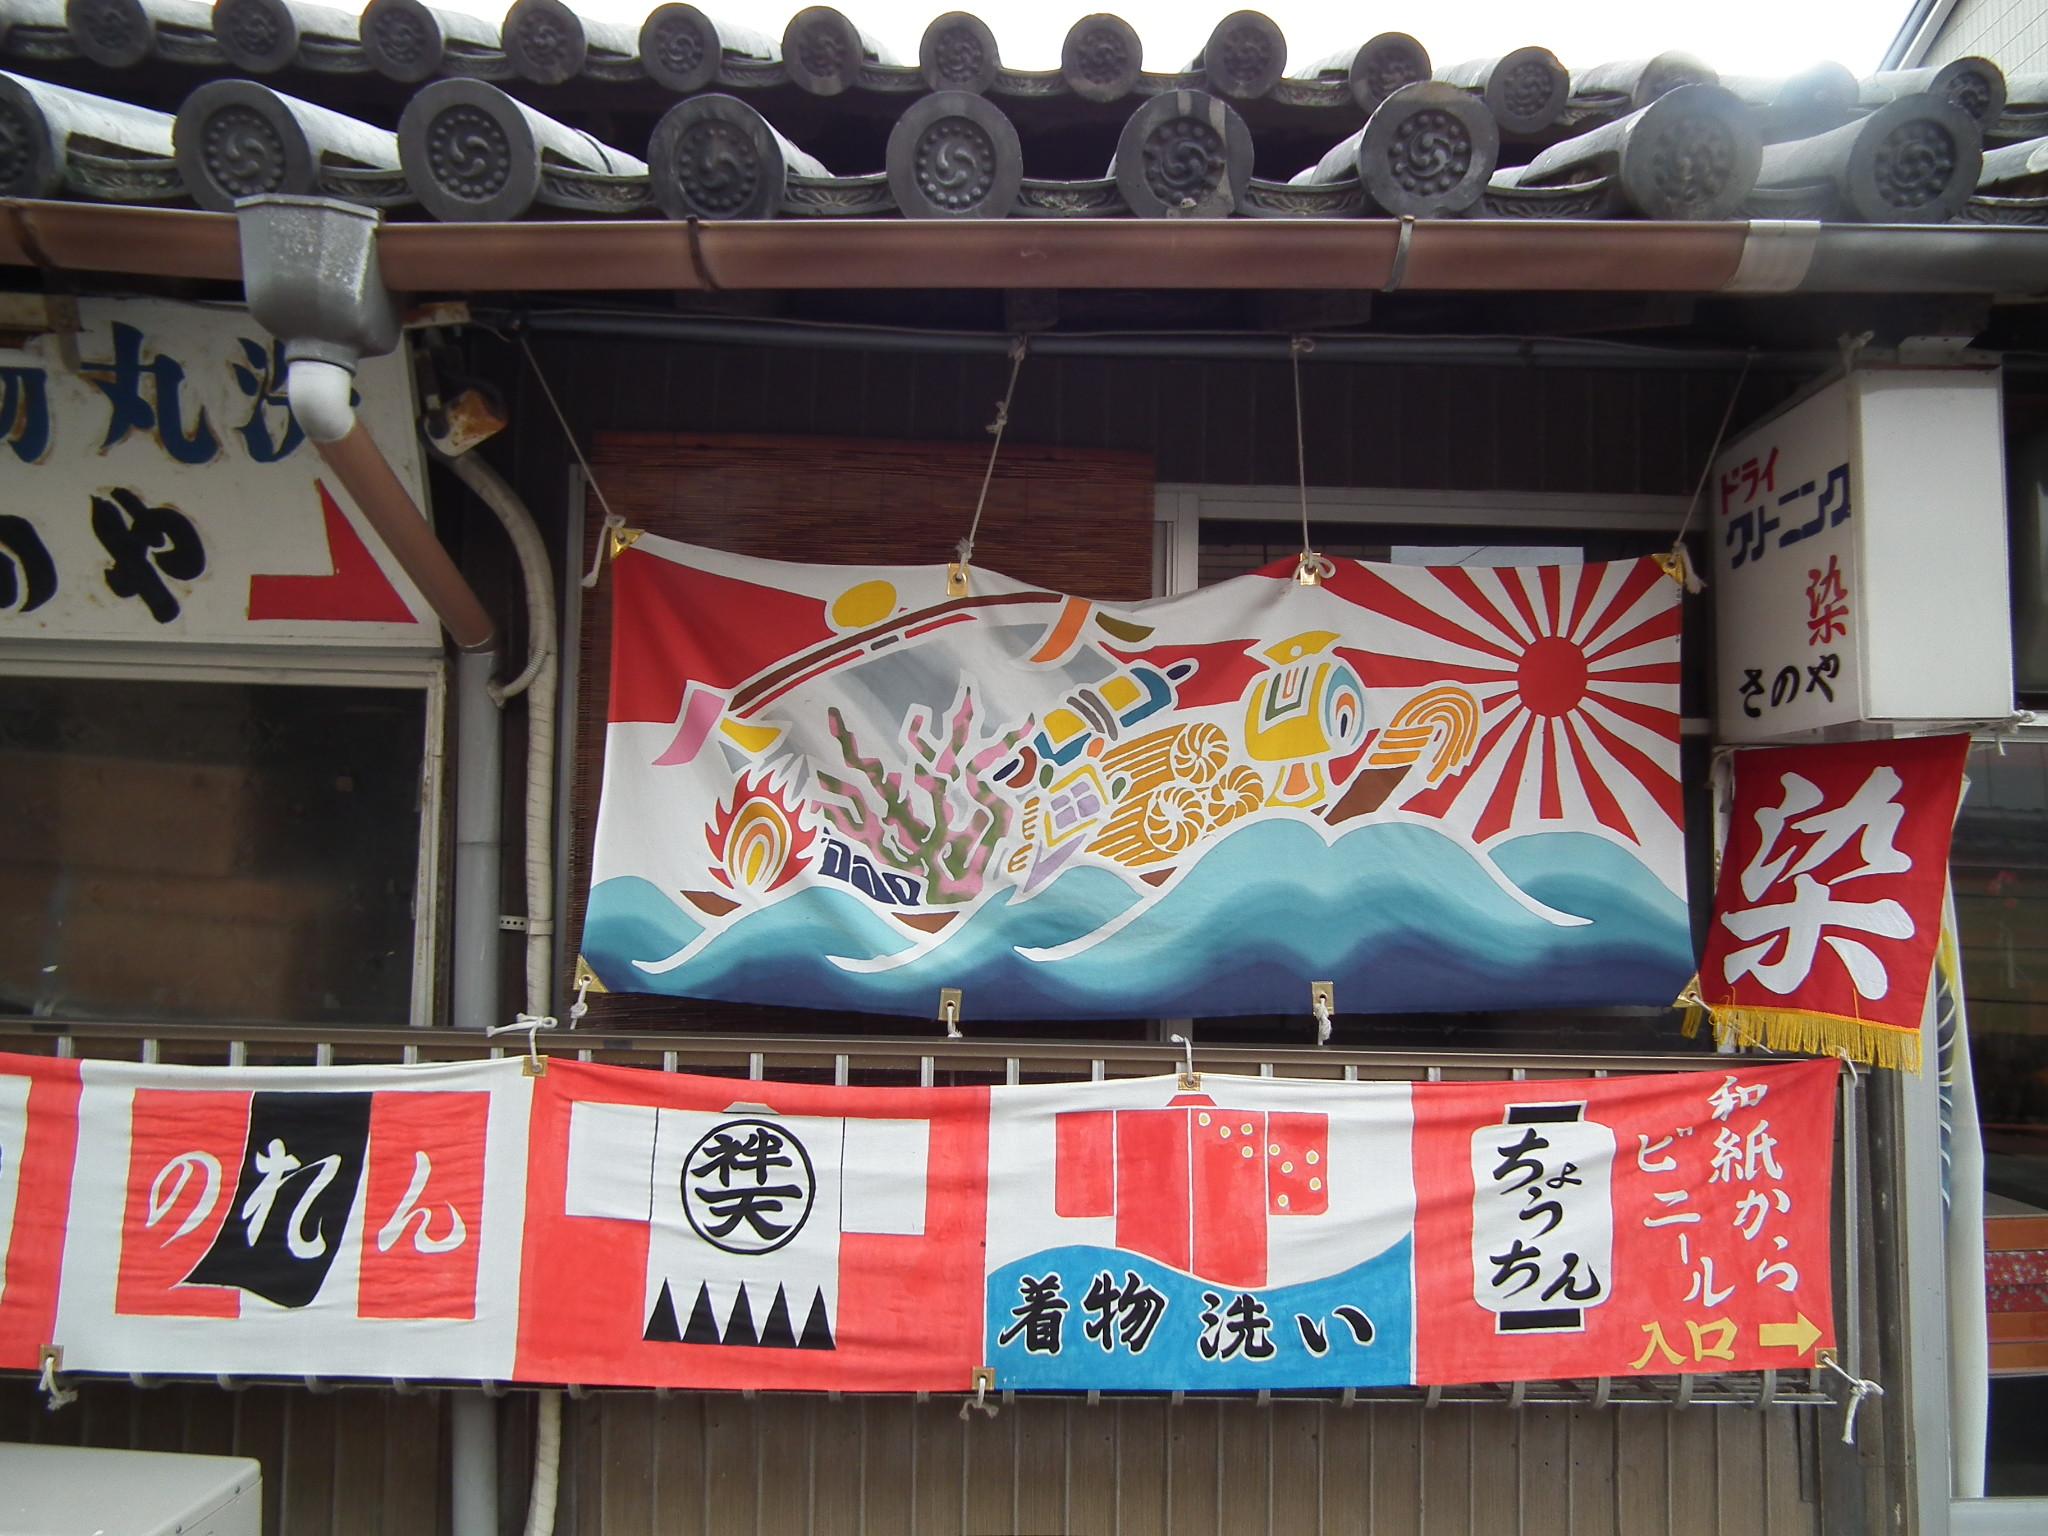 Fishermen's tairyō-bata